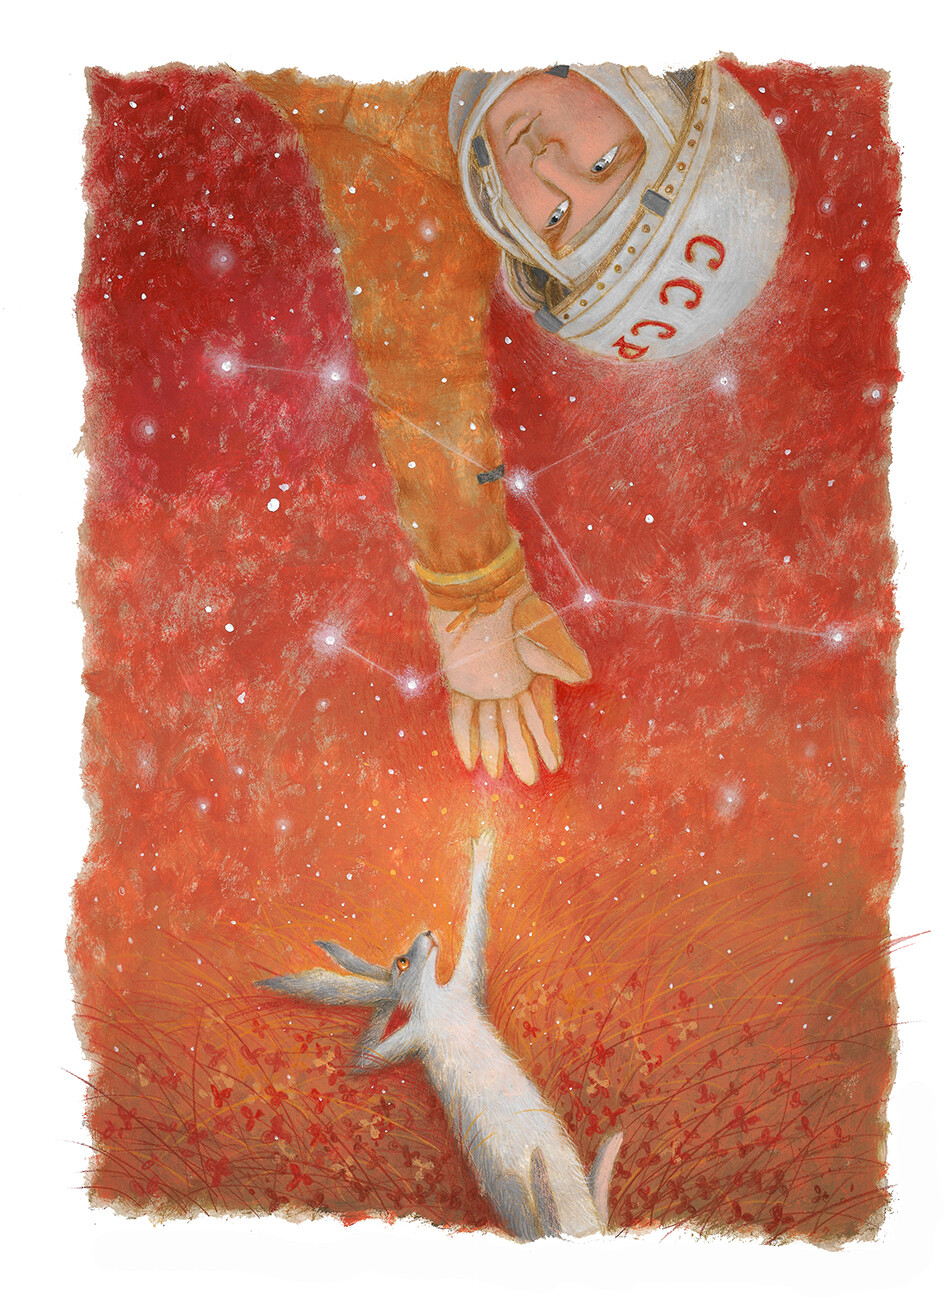 Cosmonaut and Hare